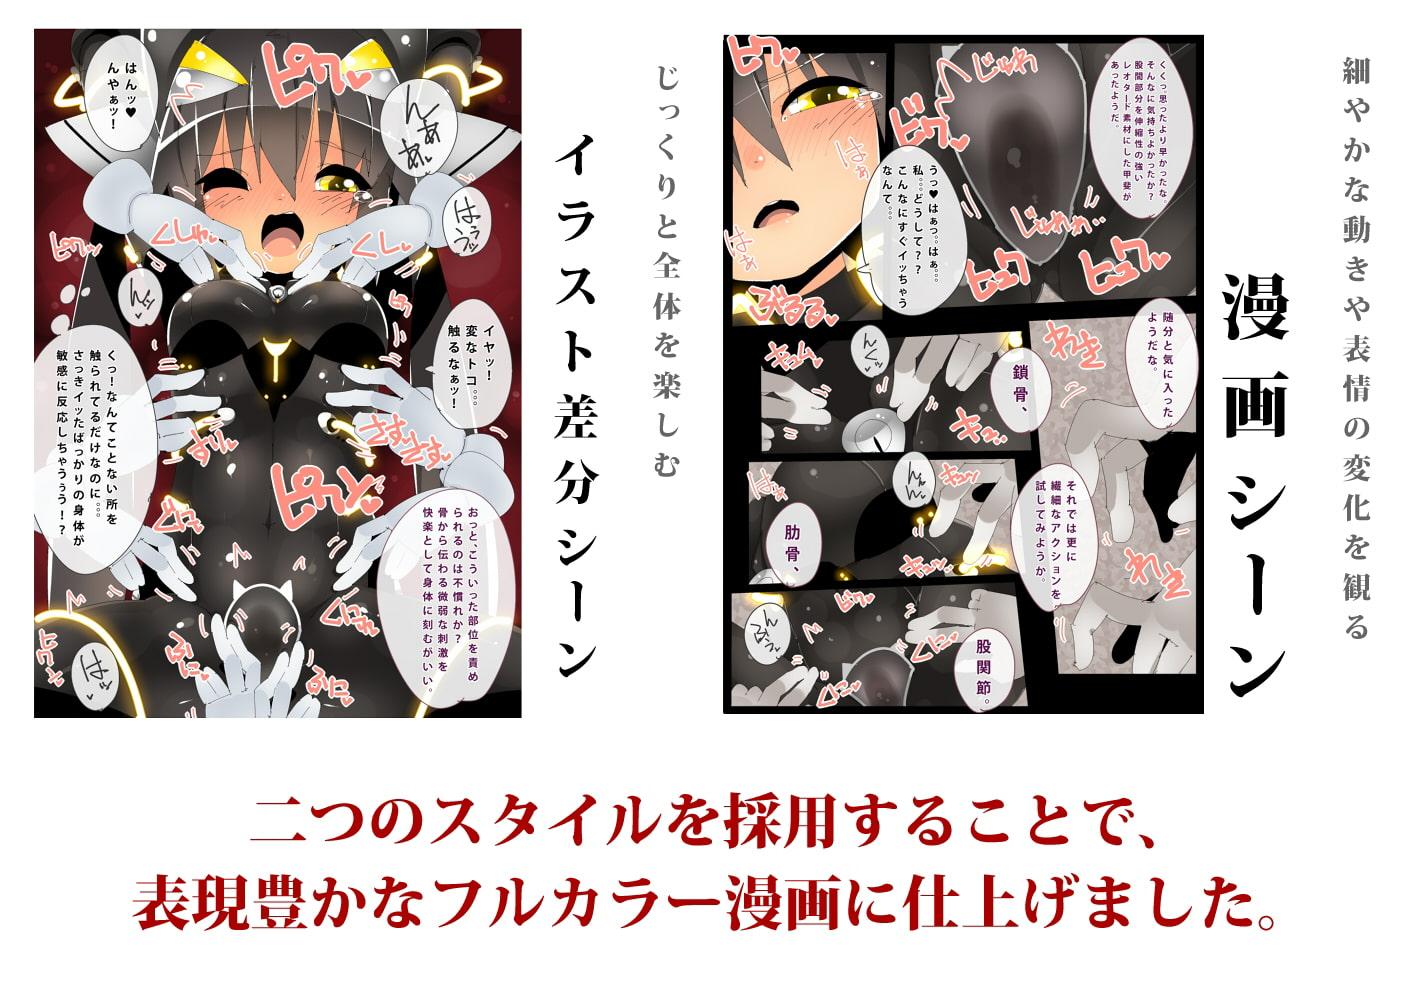 DLsite専売ヒロイン陵辱図鑑 マジックハンド 愛撫!愛撫!愛撫!